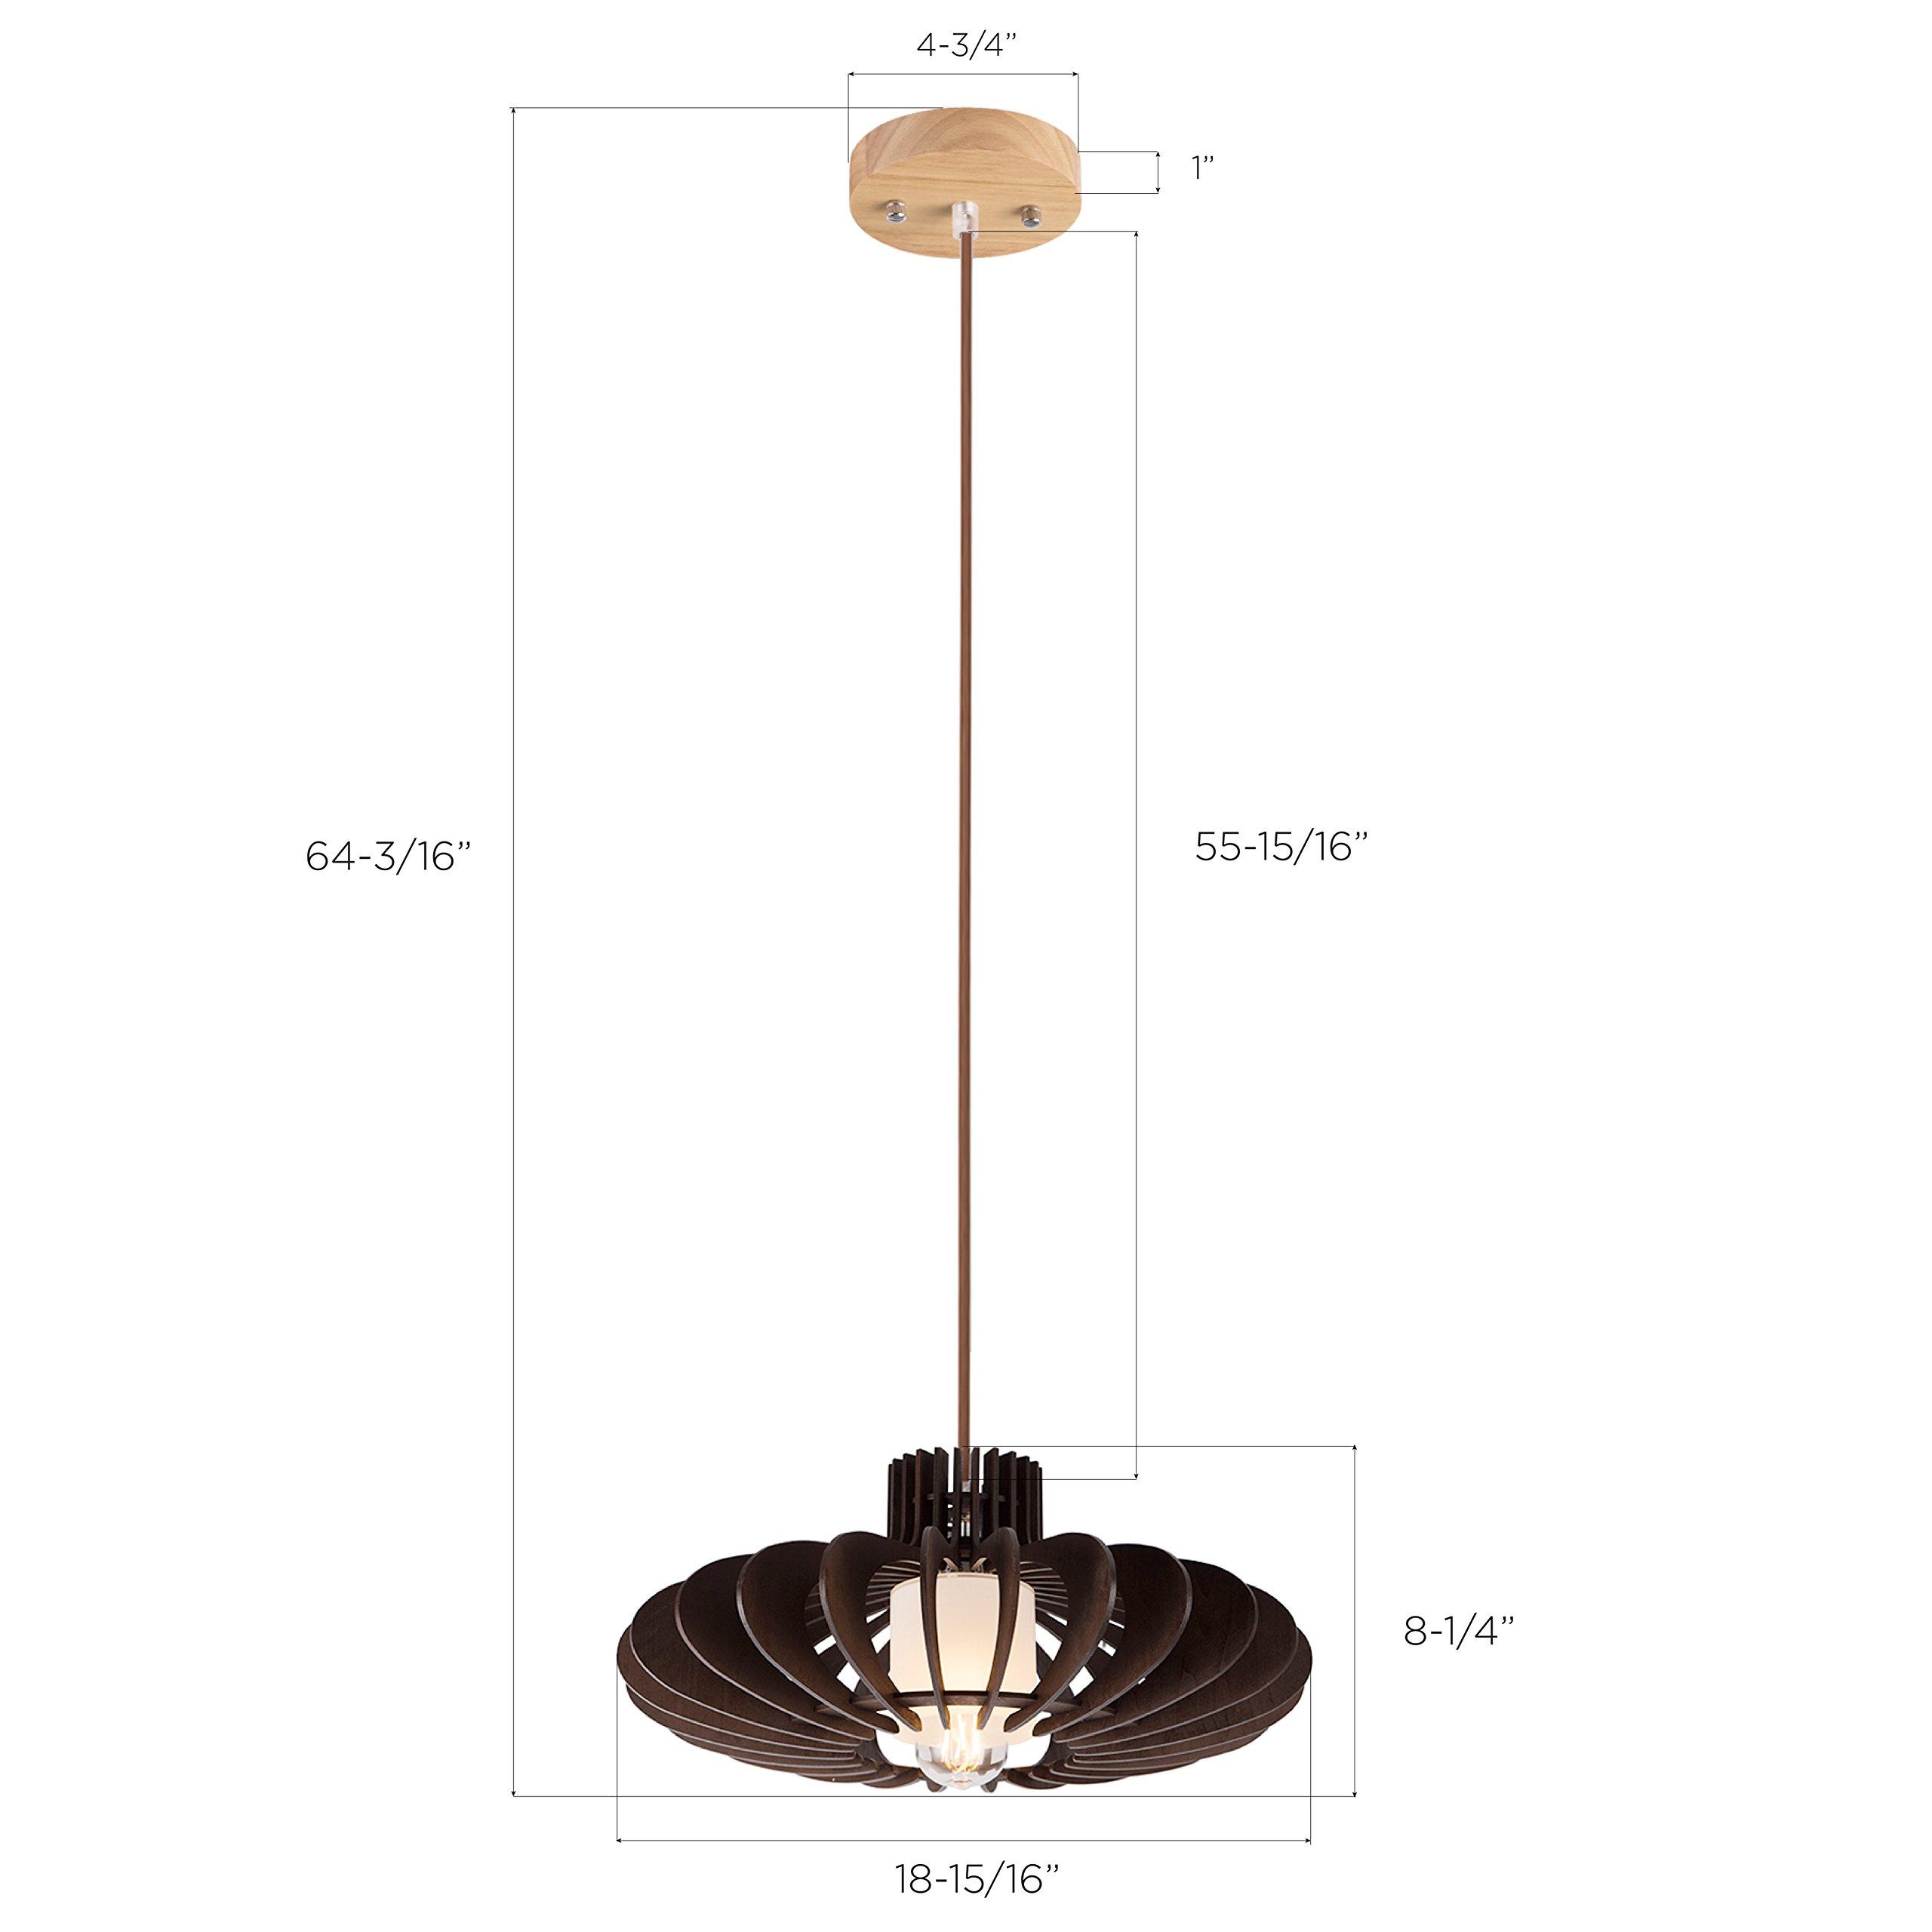 MAYKKE Oban Medium Wooden Pendant Lamp   Lantern Style with Dark Brown Rings, Hanging Light with Adjustable Cord   Walnut Wood Finish, MDB1040201 by Maykke (Image #6)